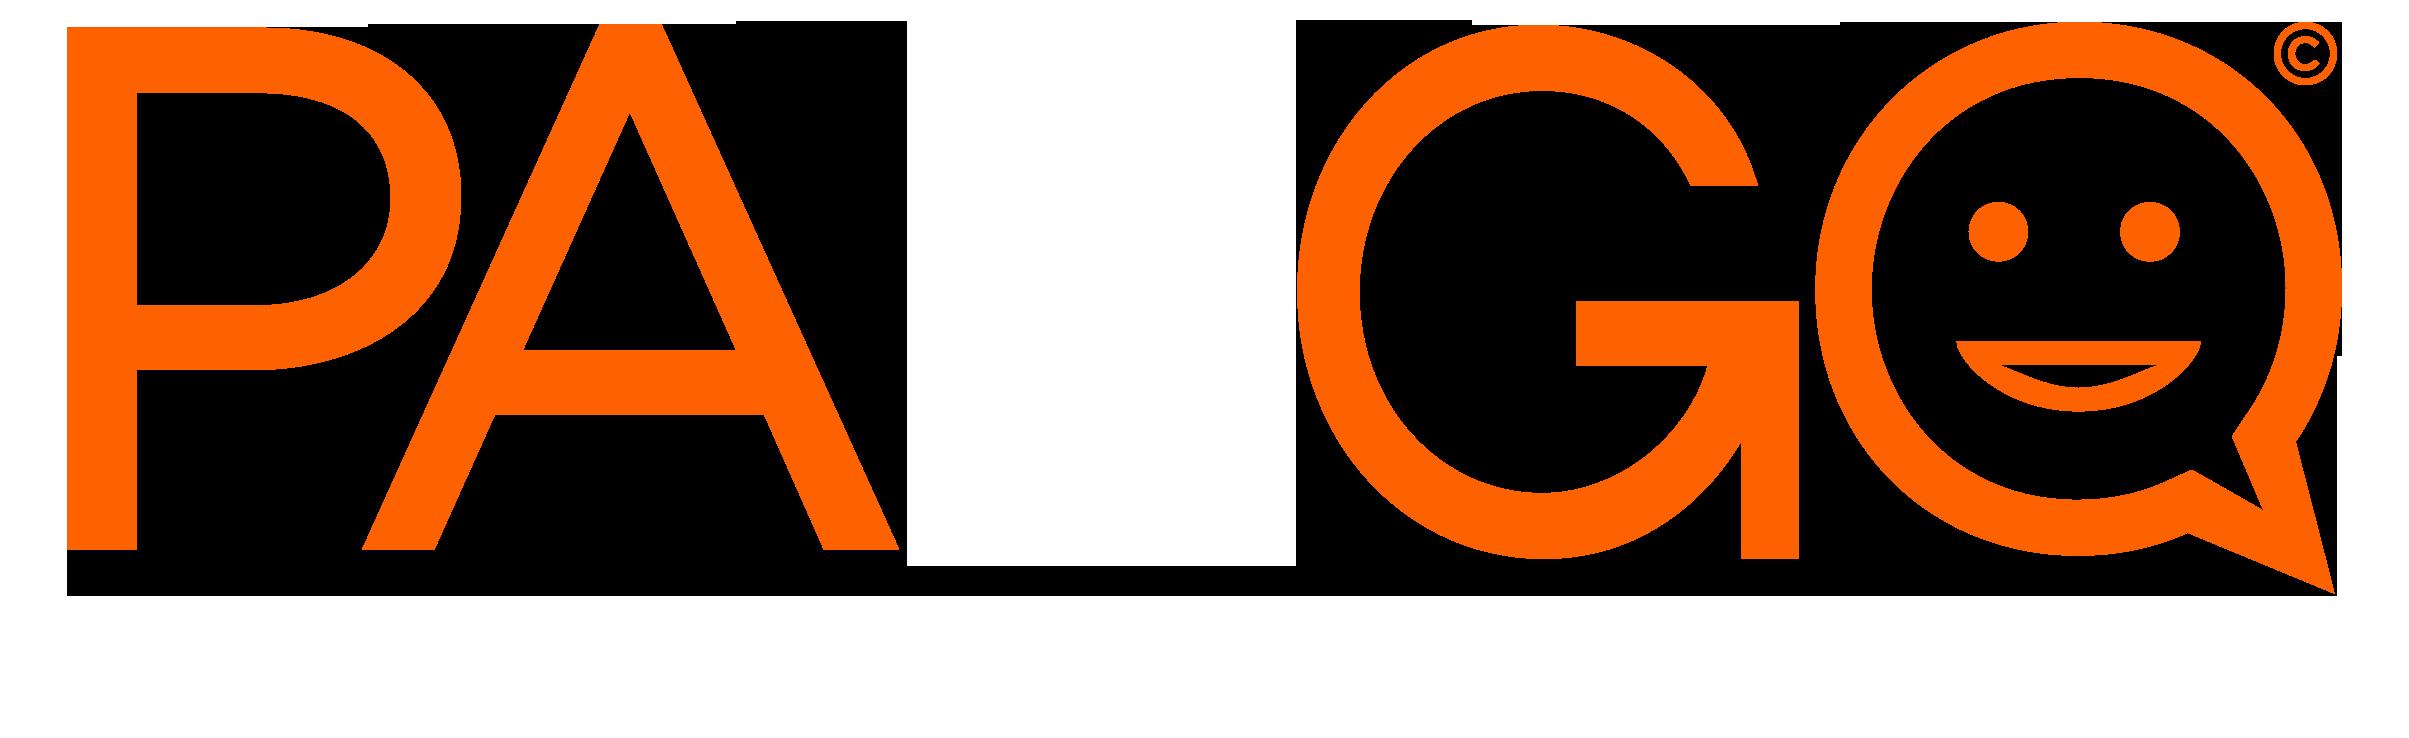 pa2go